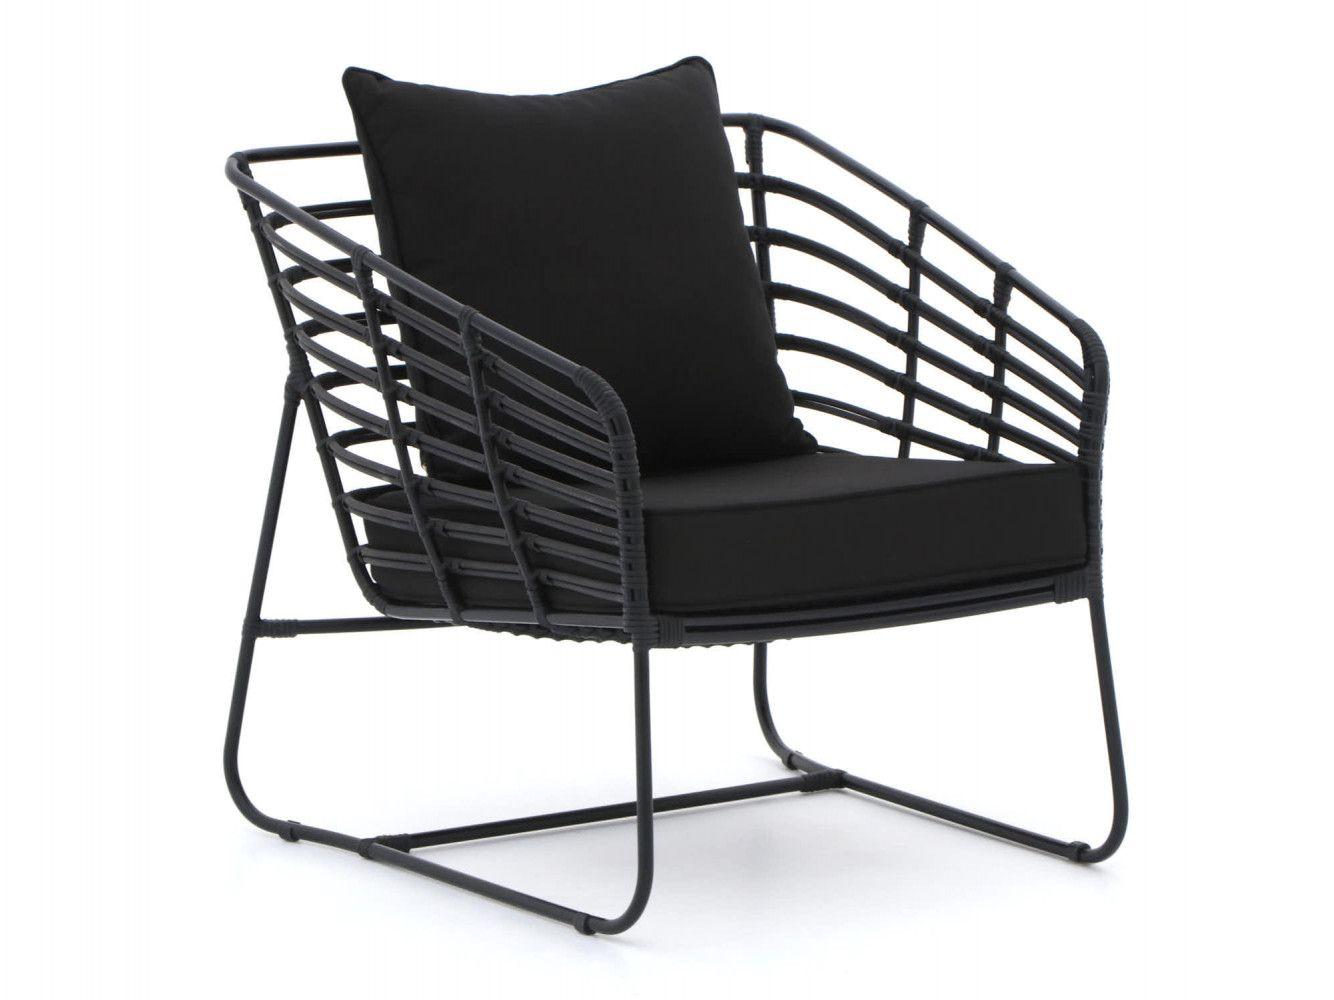 Zwarte Lounge Stoel.Zwarte Lounge Tuinstoel Van Giardo Furniture Tuinstoelen In